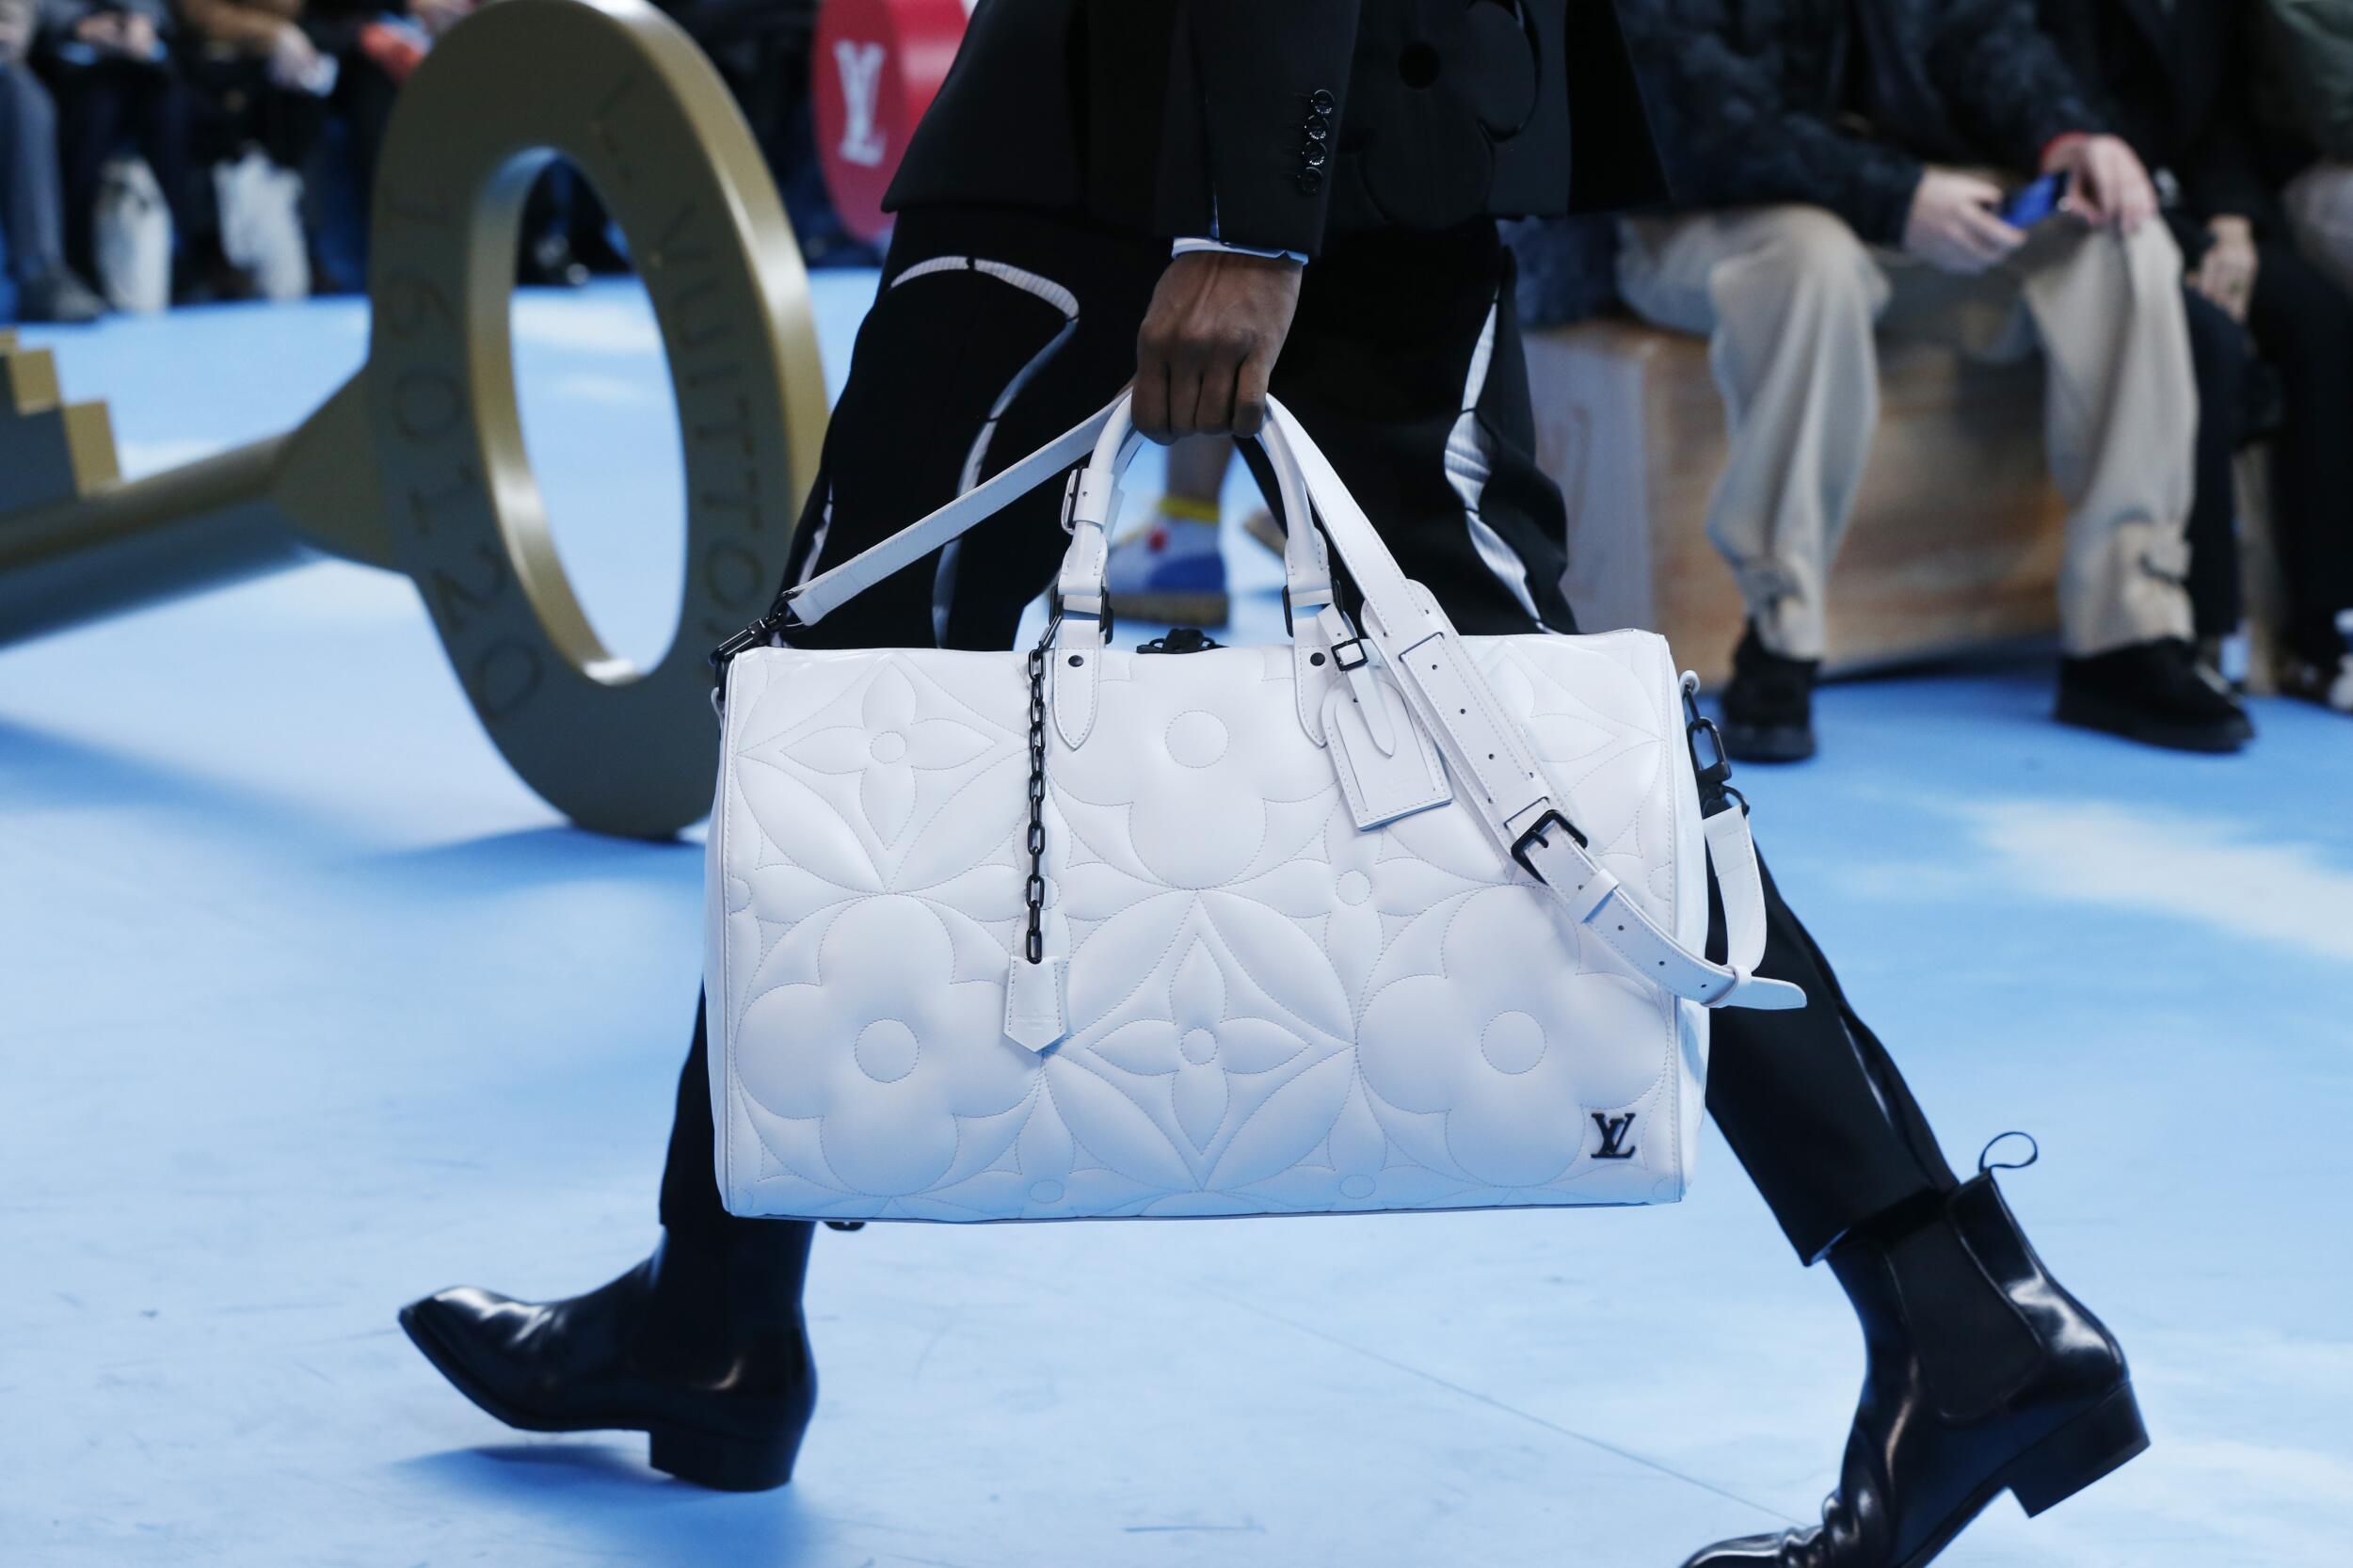 Bag Louis Vuitton Fall Winter 2020 Collection Paris Fashion Week